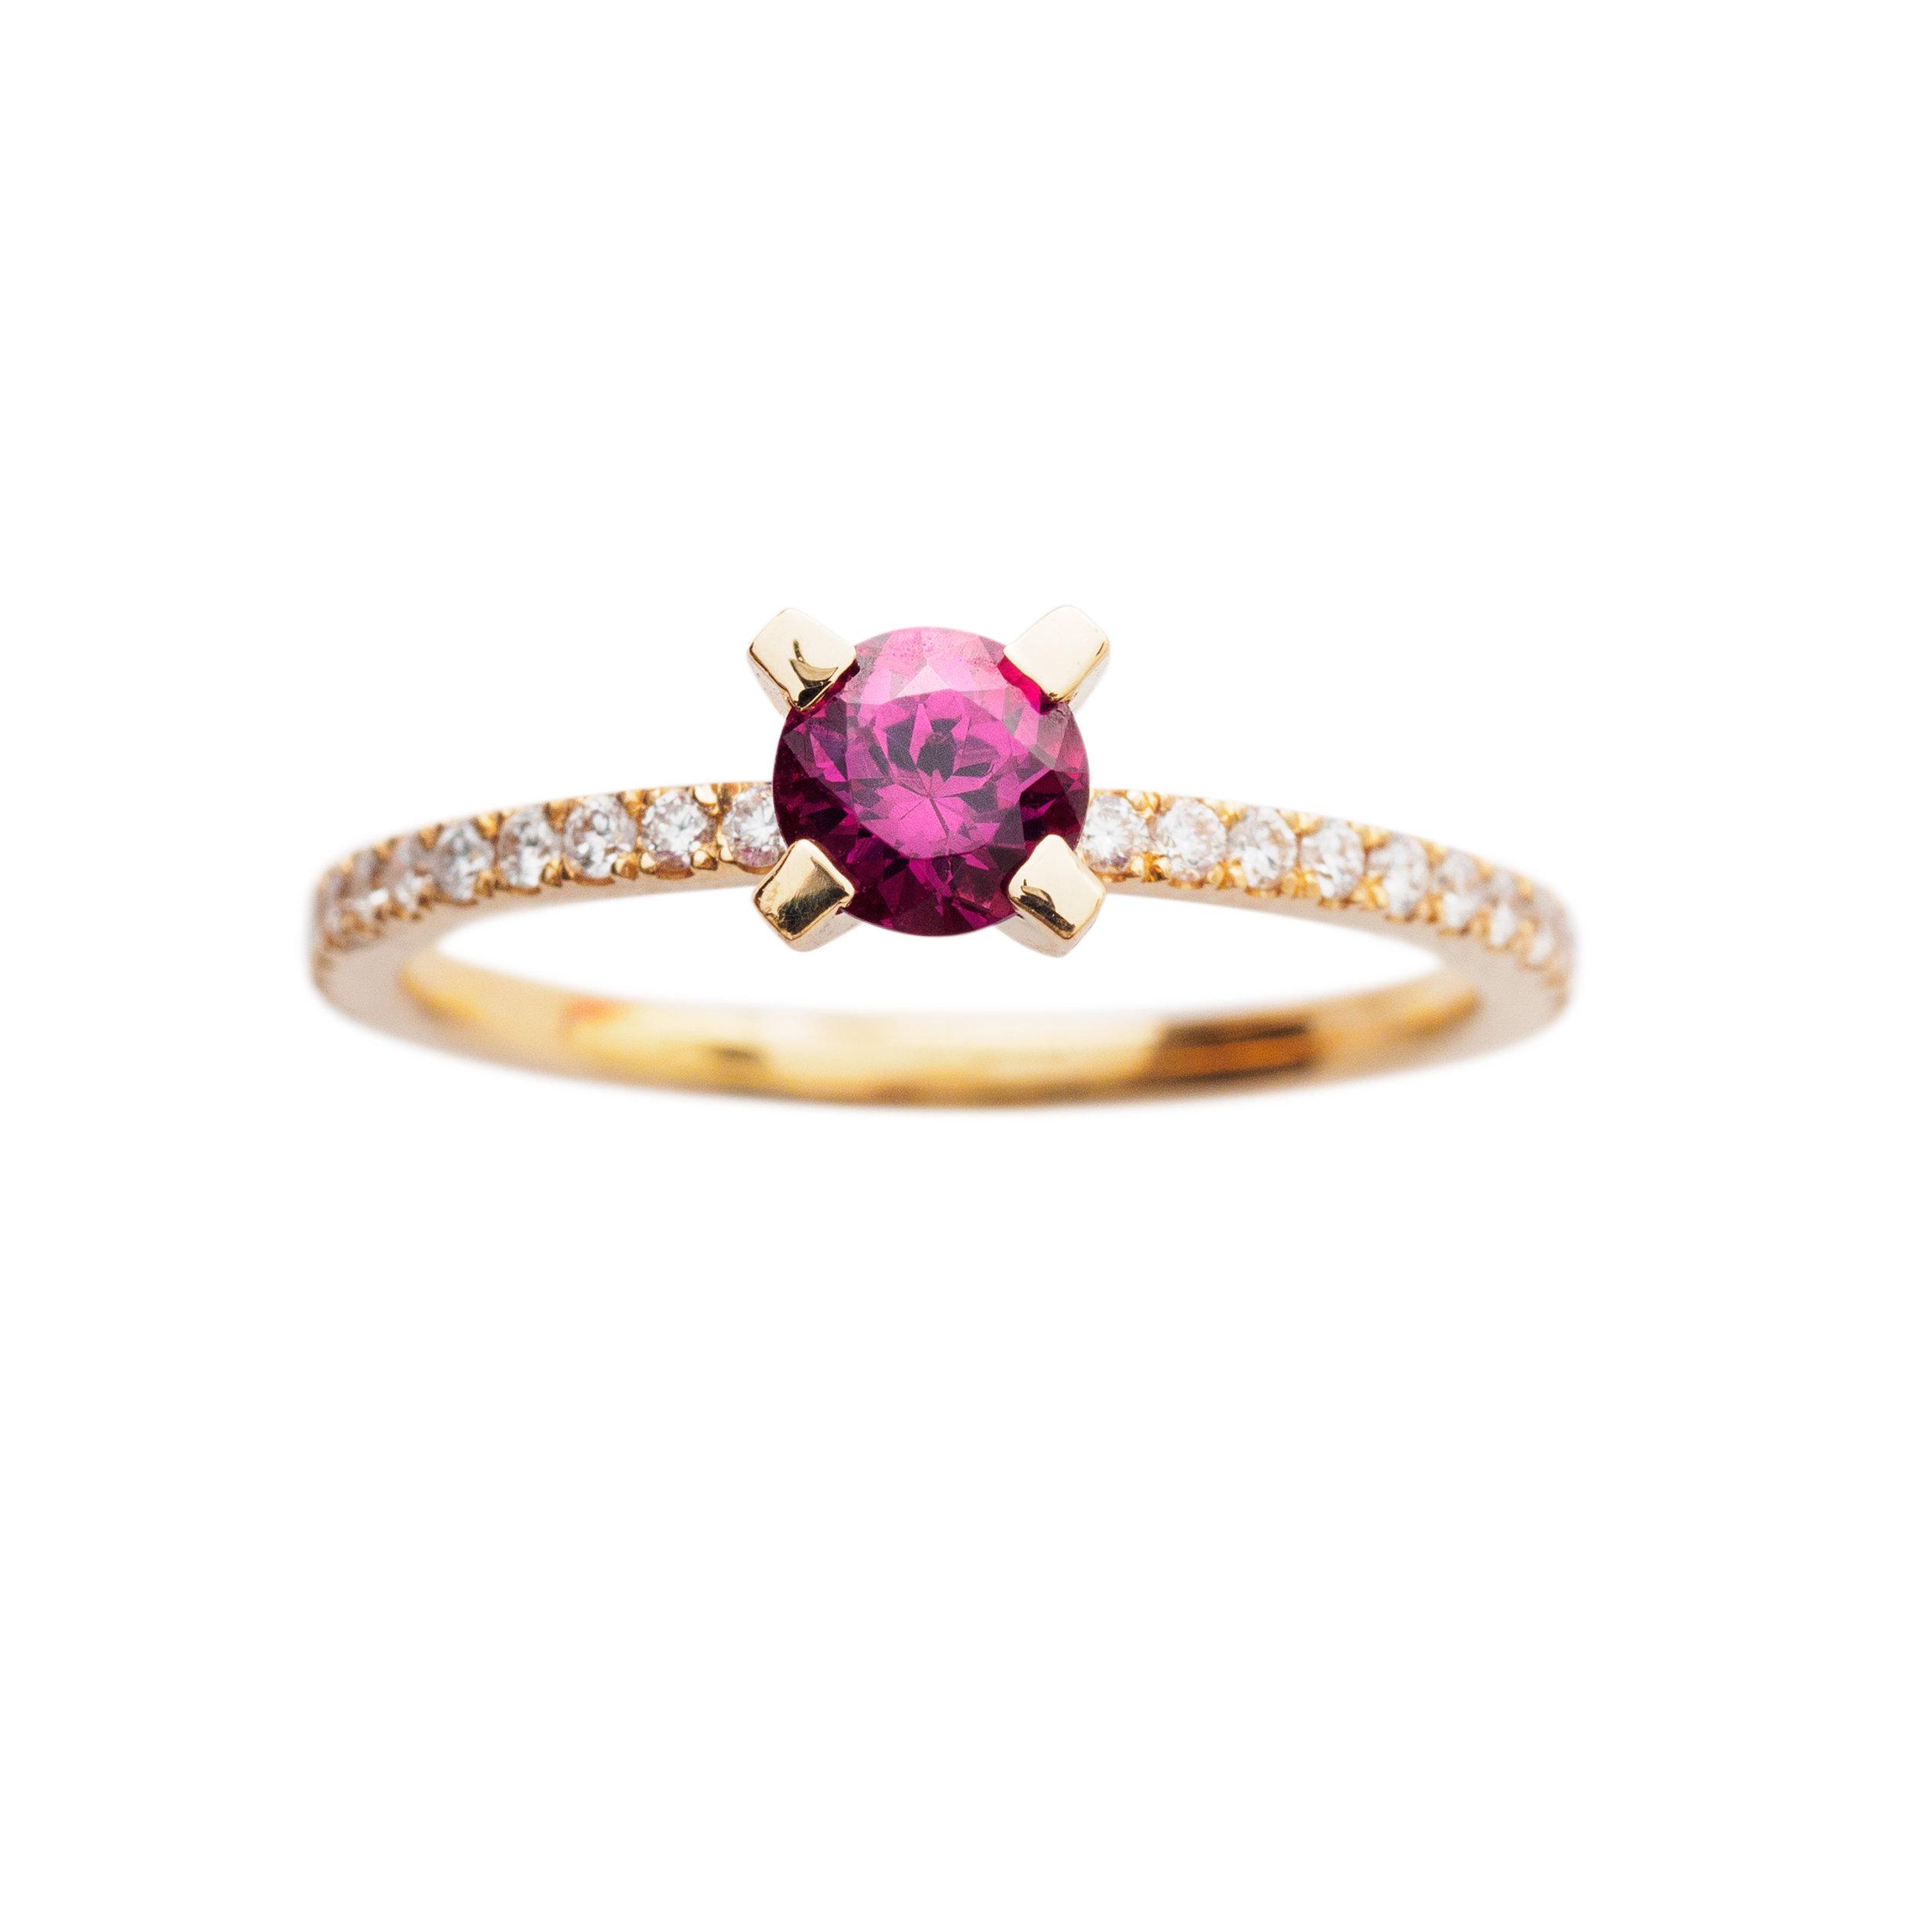 FIRENZE RING 21.200 NOK. 18 kt gold, diamonds and purple topaz